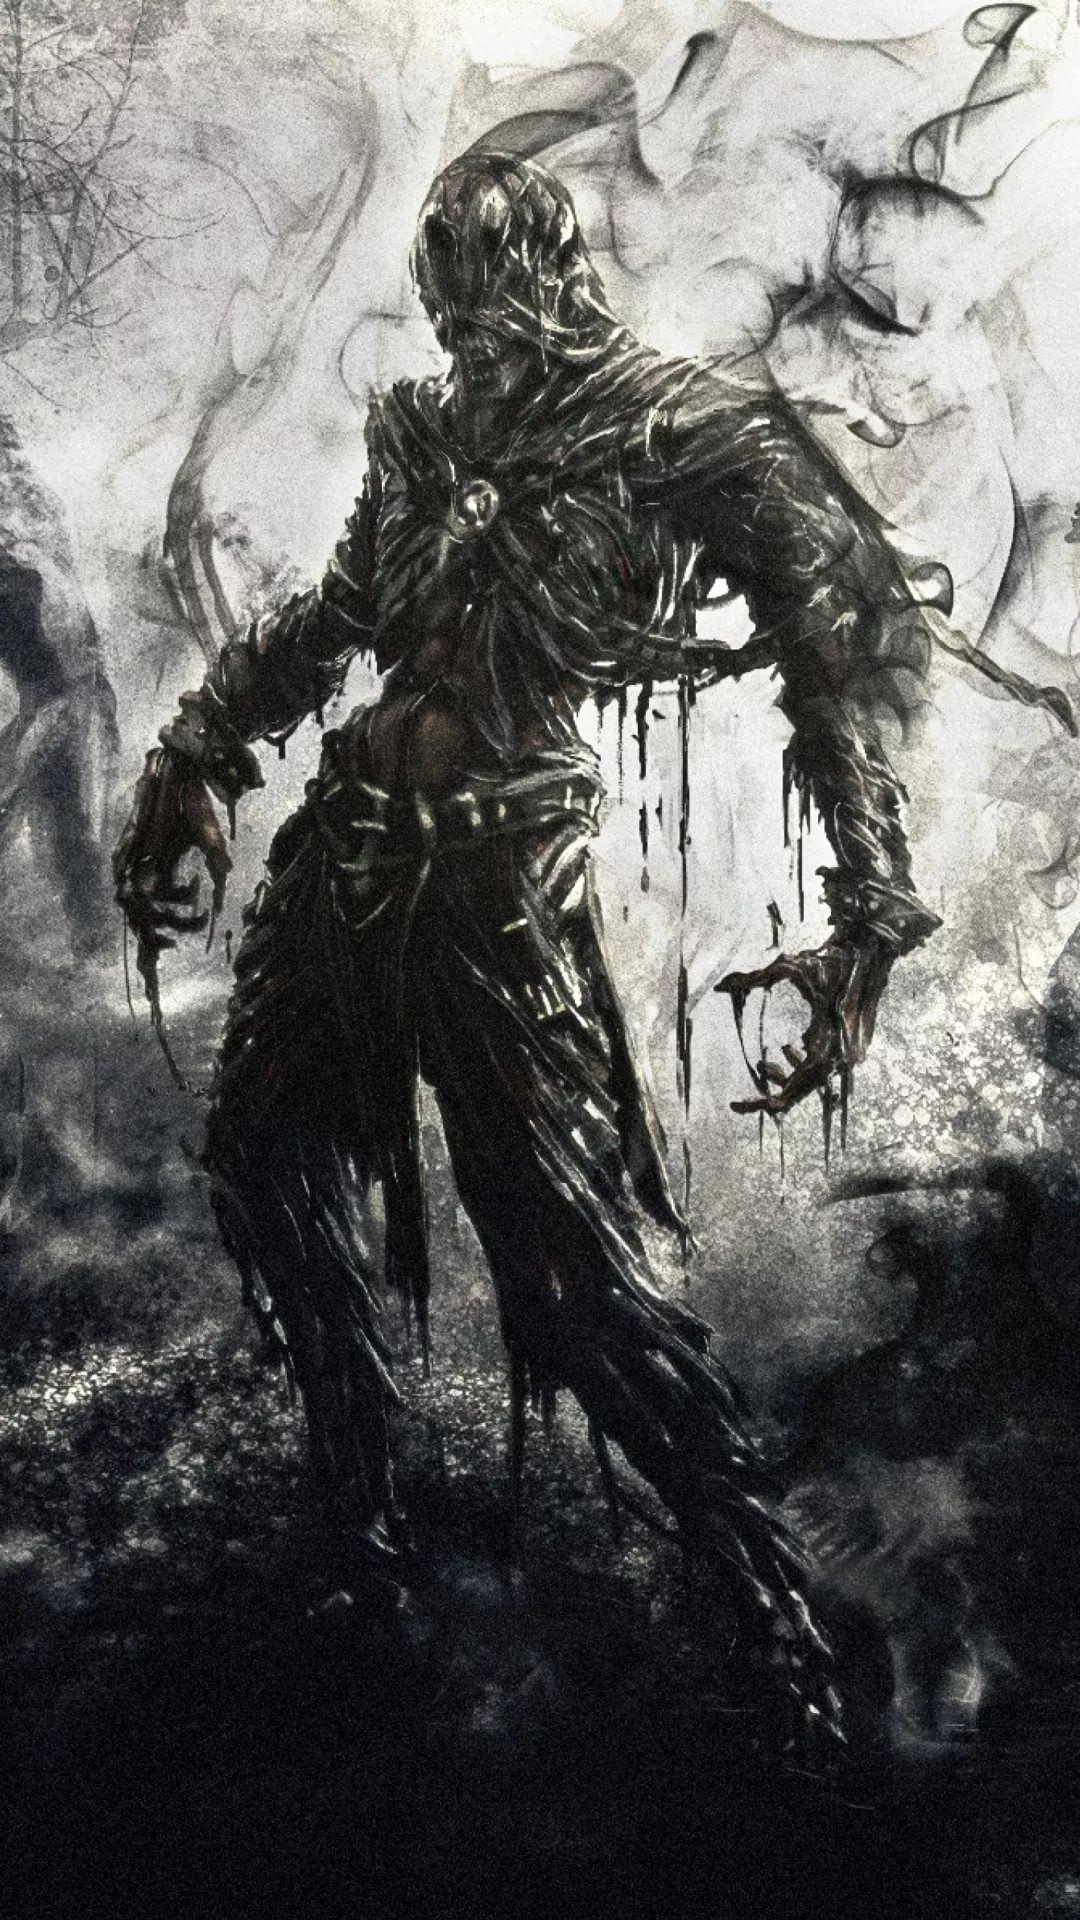 Zombie Galaxy s9 wallpaper